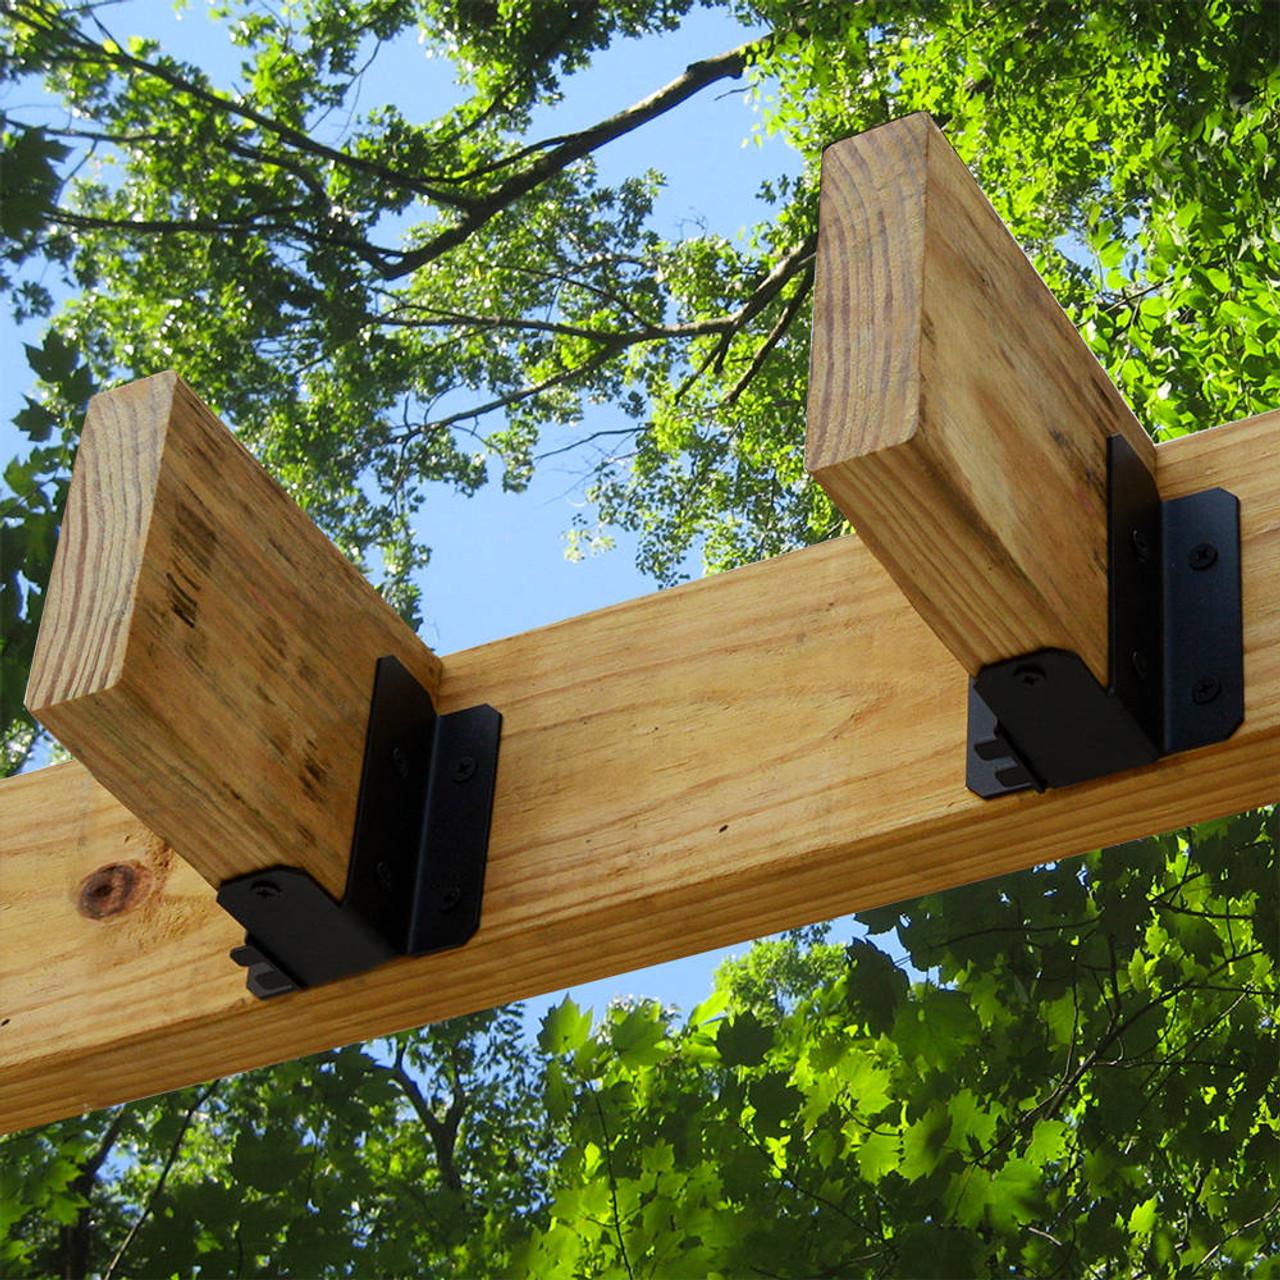 Wood Joists Secured with OZCO OWT Joist Hangers - Flush